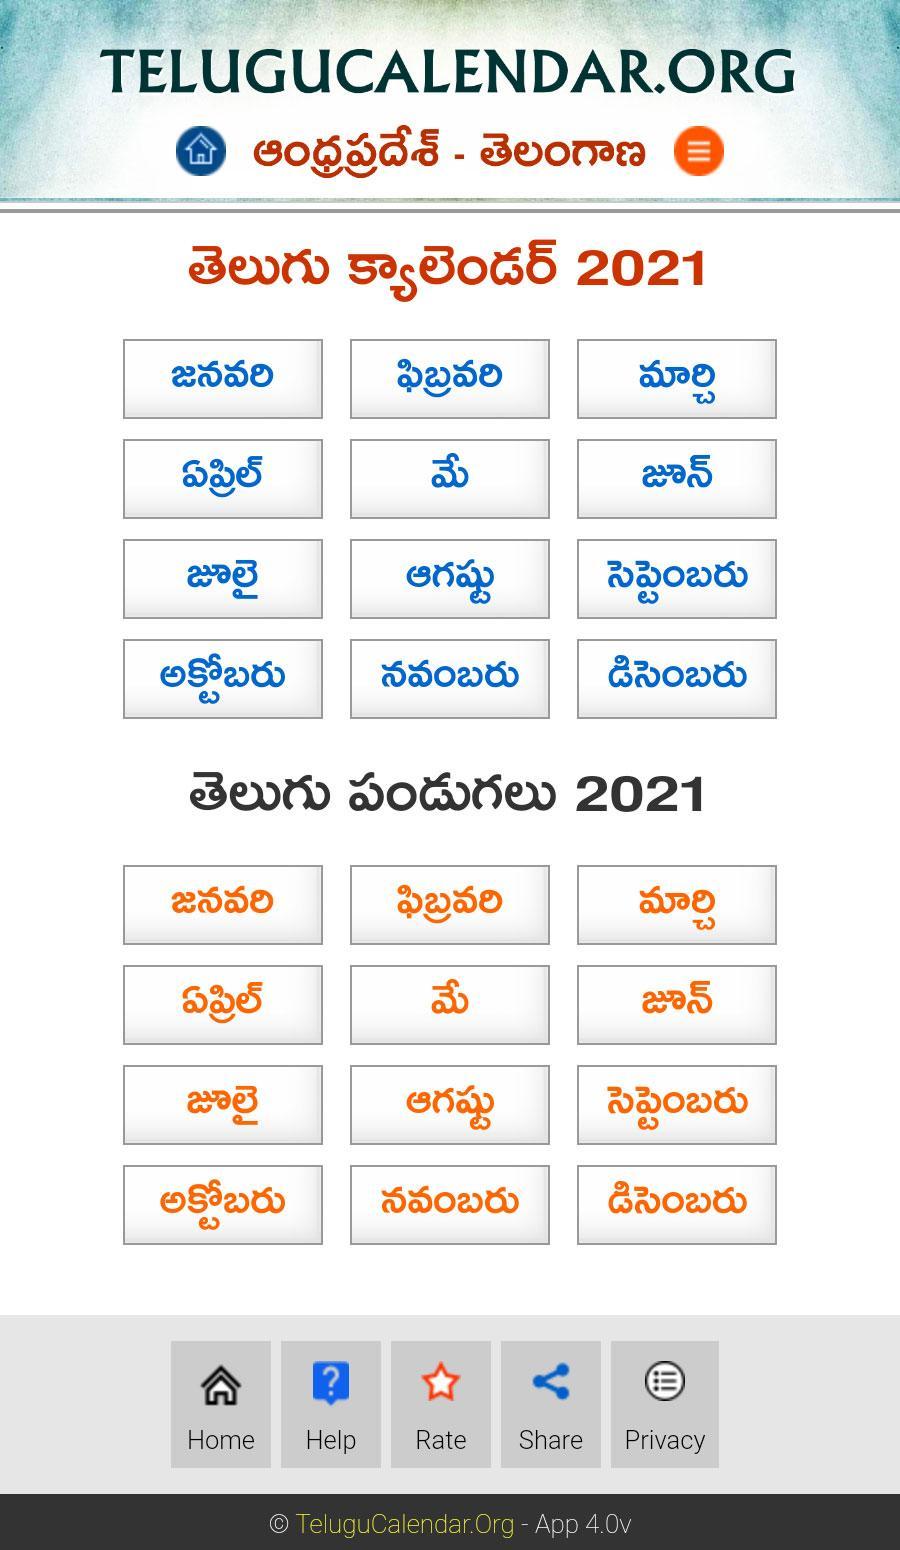 New Jersey Telugu Calendar 2022.Telugu Panchangam 2021 2022 Rasi Phalalu In Telugu For Android Apk Download